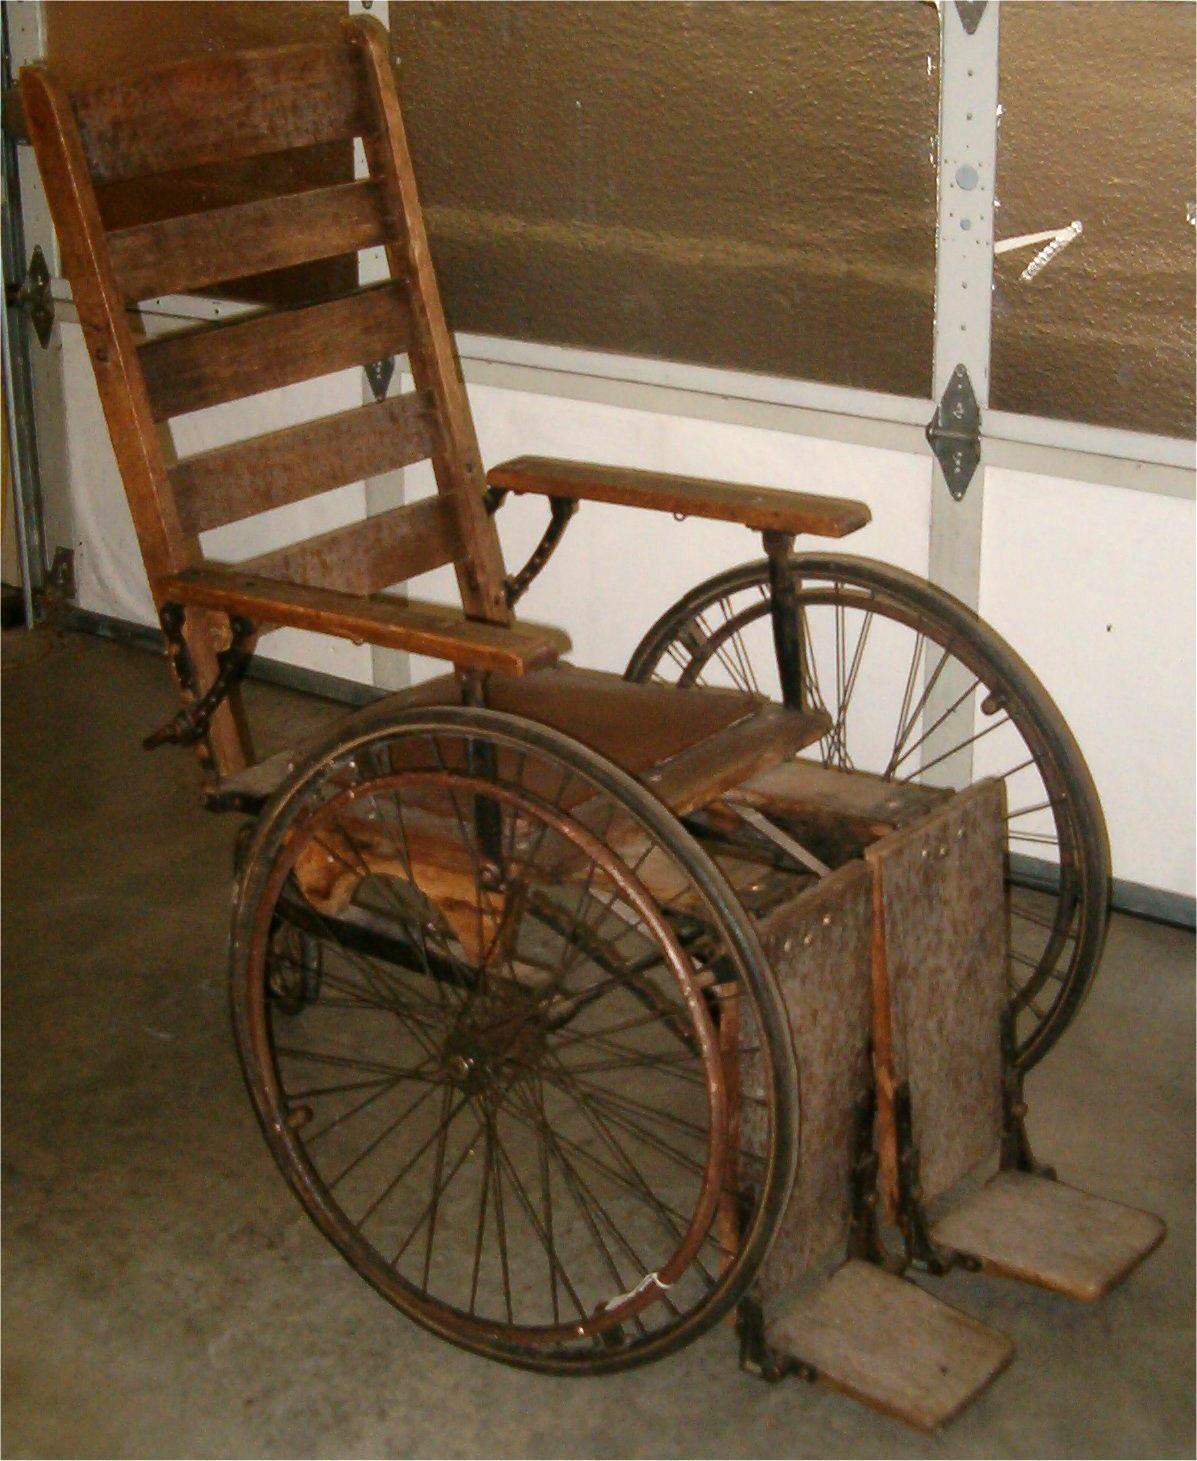 ... Antique Wheel Chair 2 by Falln-Stock - Antique Wheel Chair 2 By Falln-Stock On DeviantArt